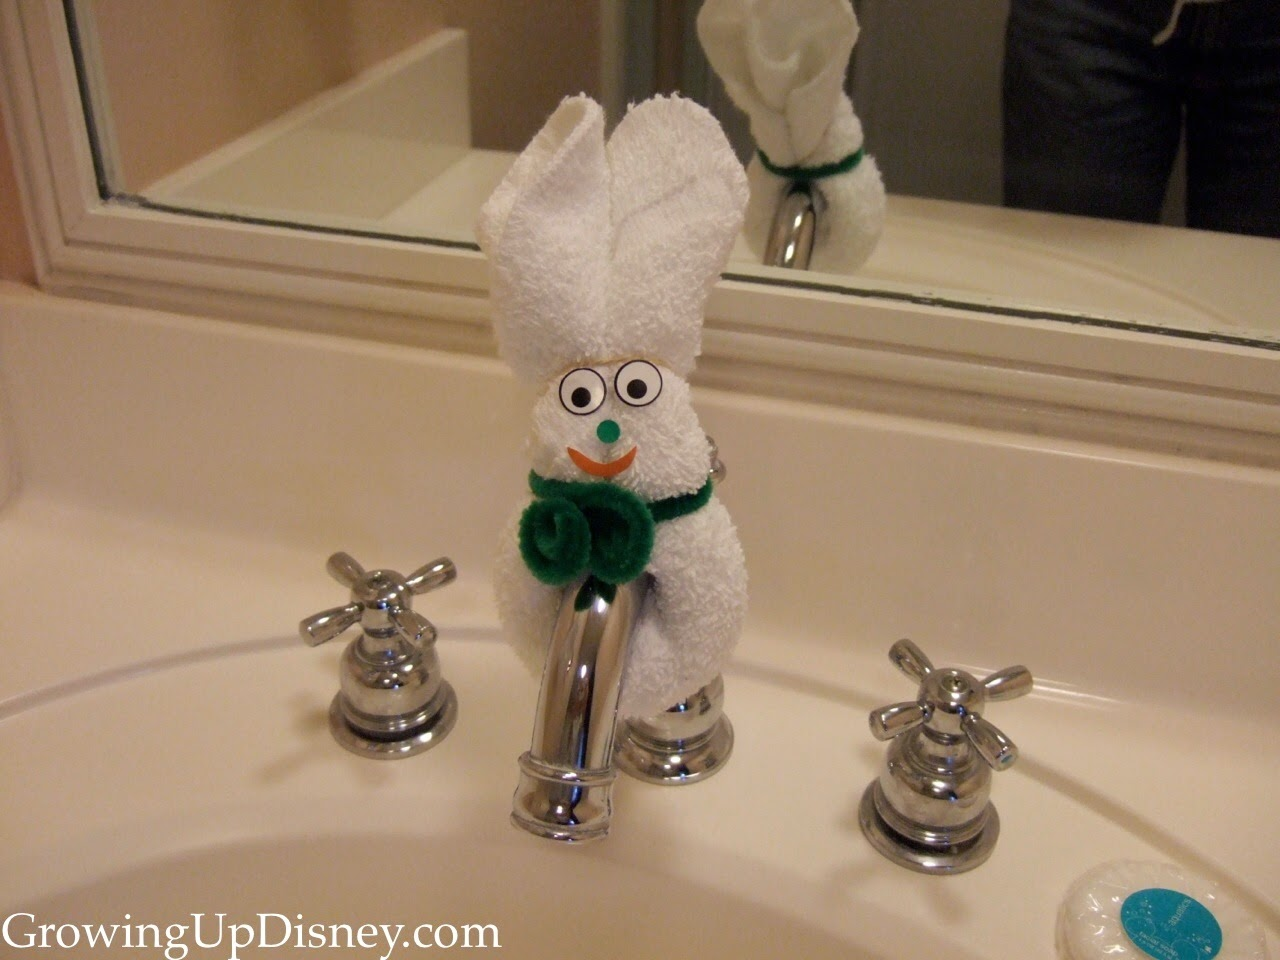 towel animal at Walt Disney World, Old Key West